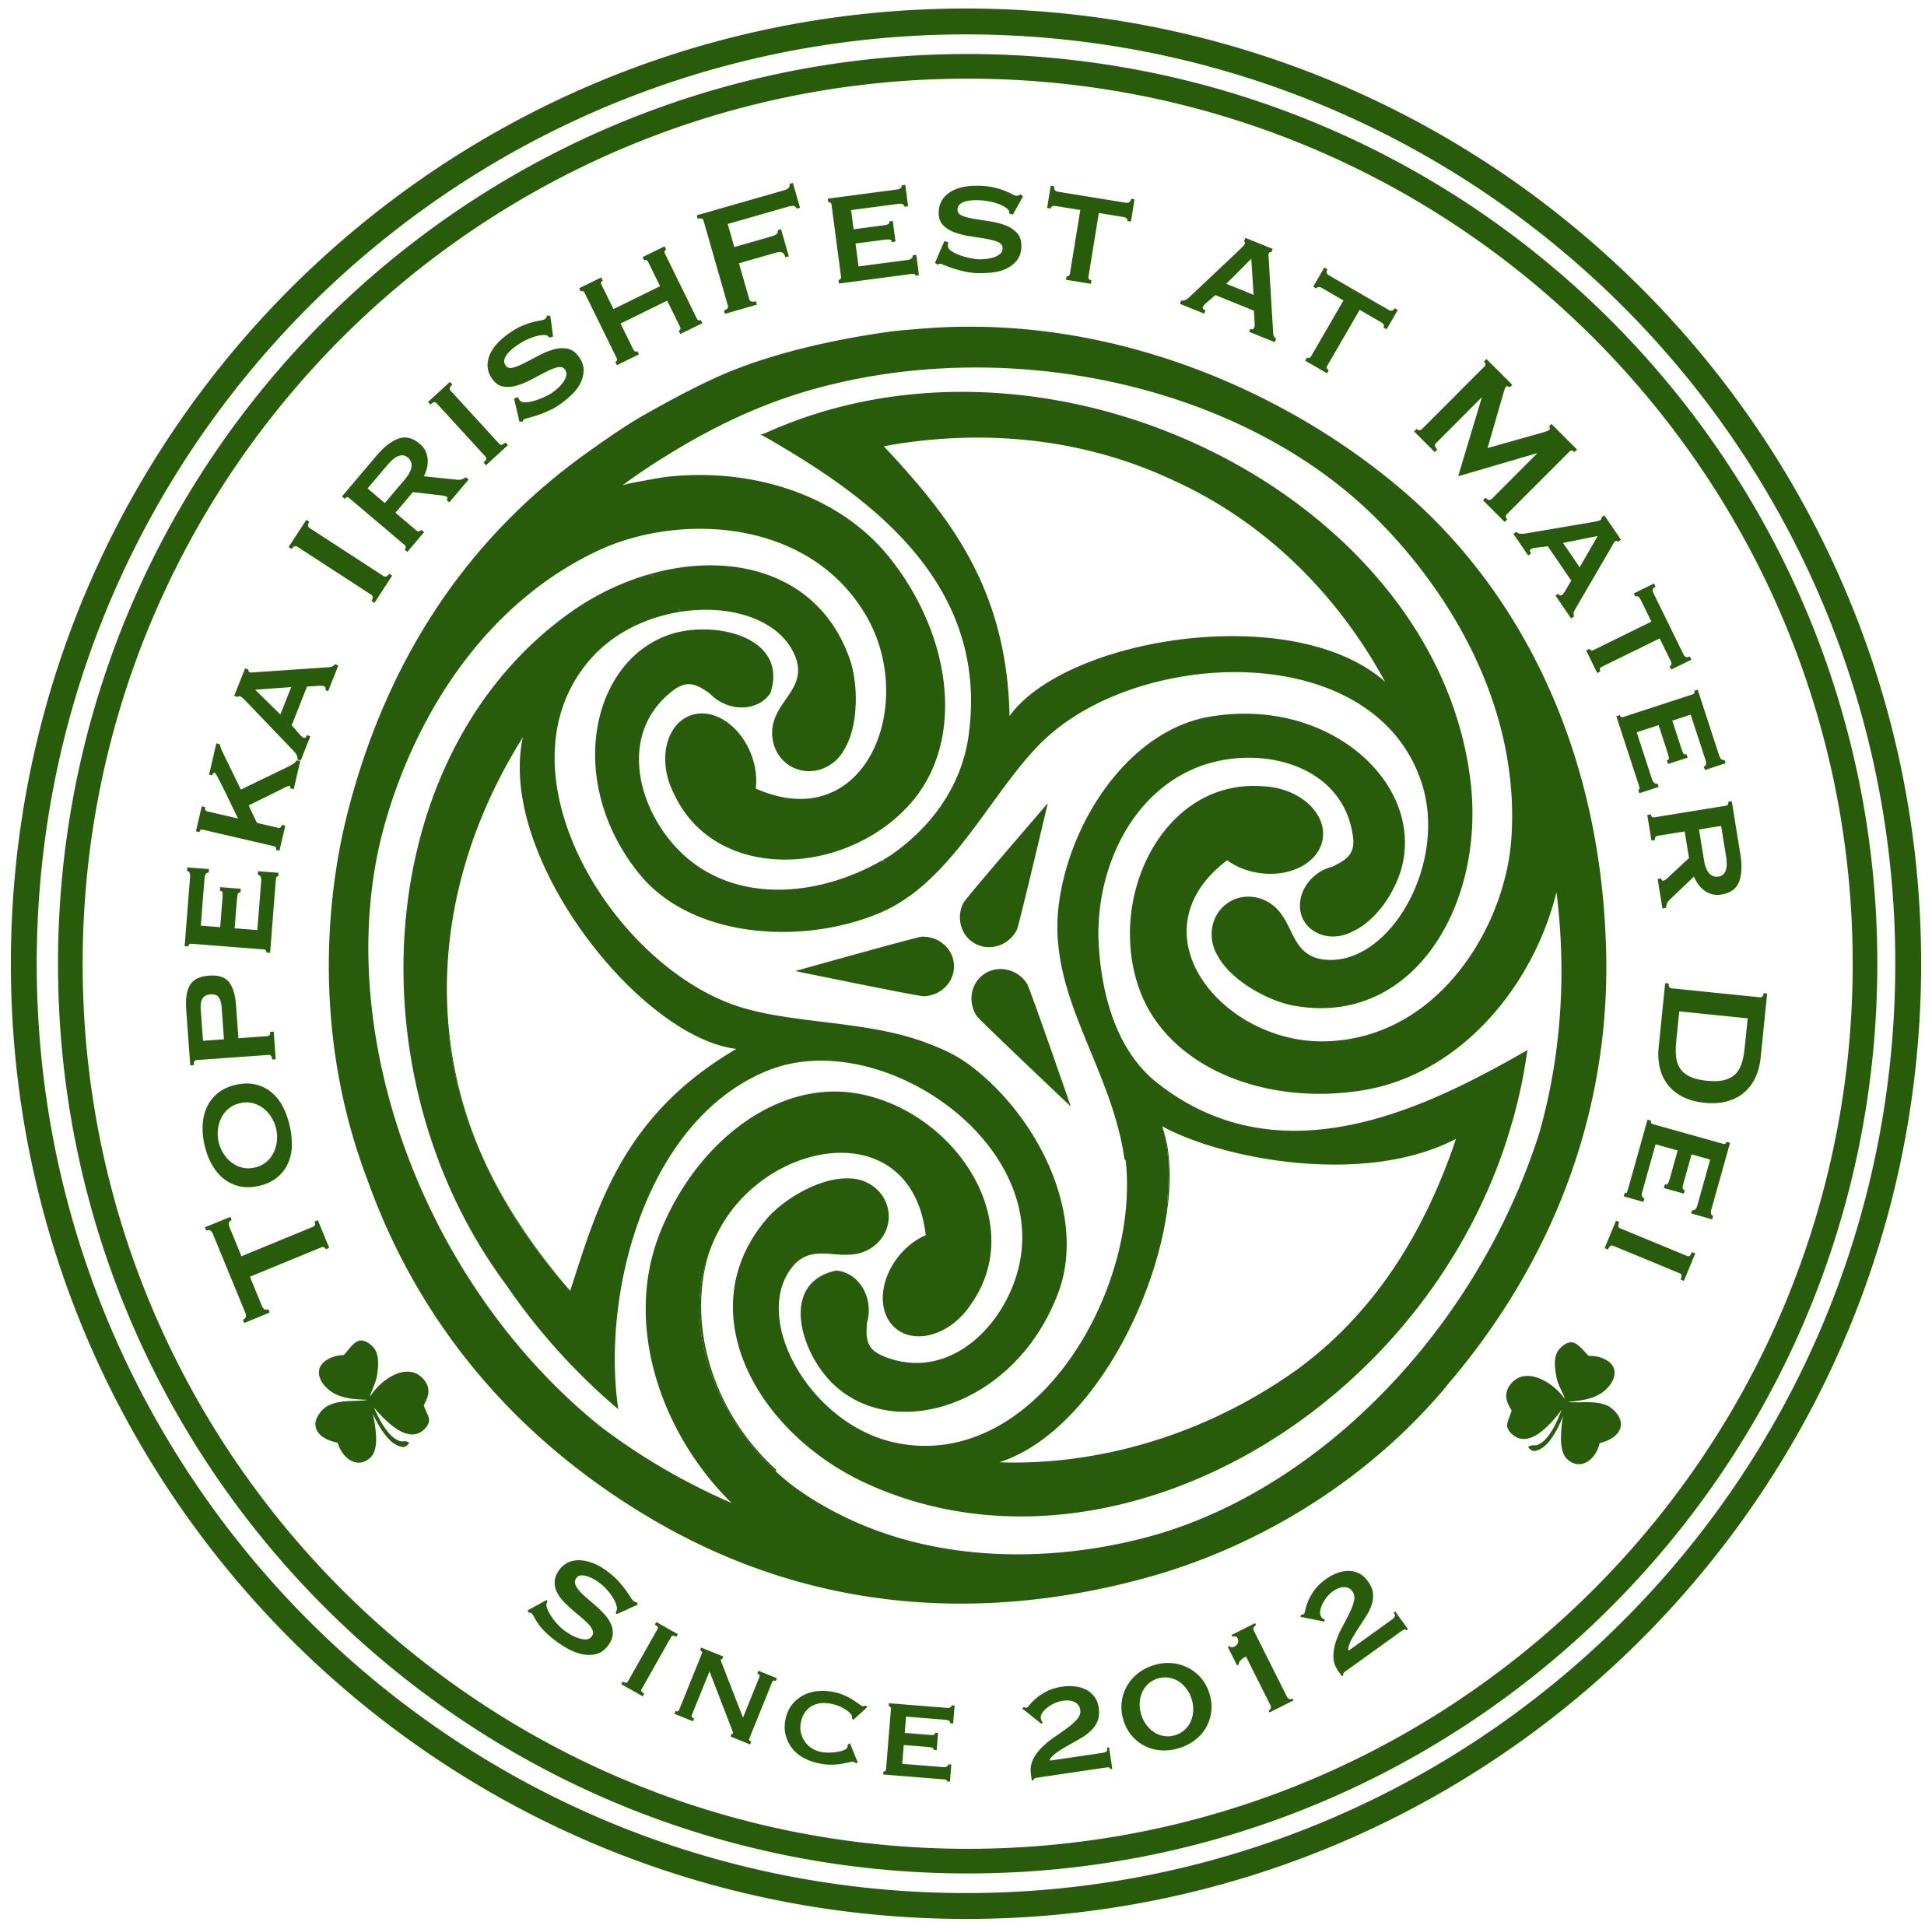 Topeka's Original IrishFest